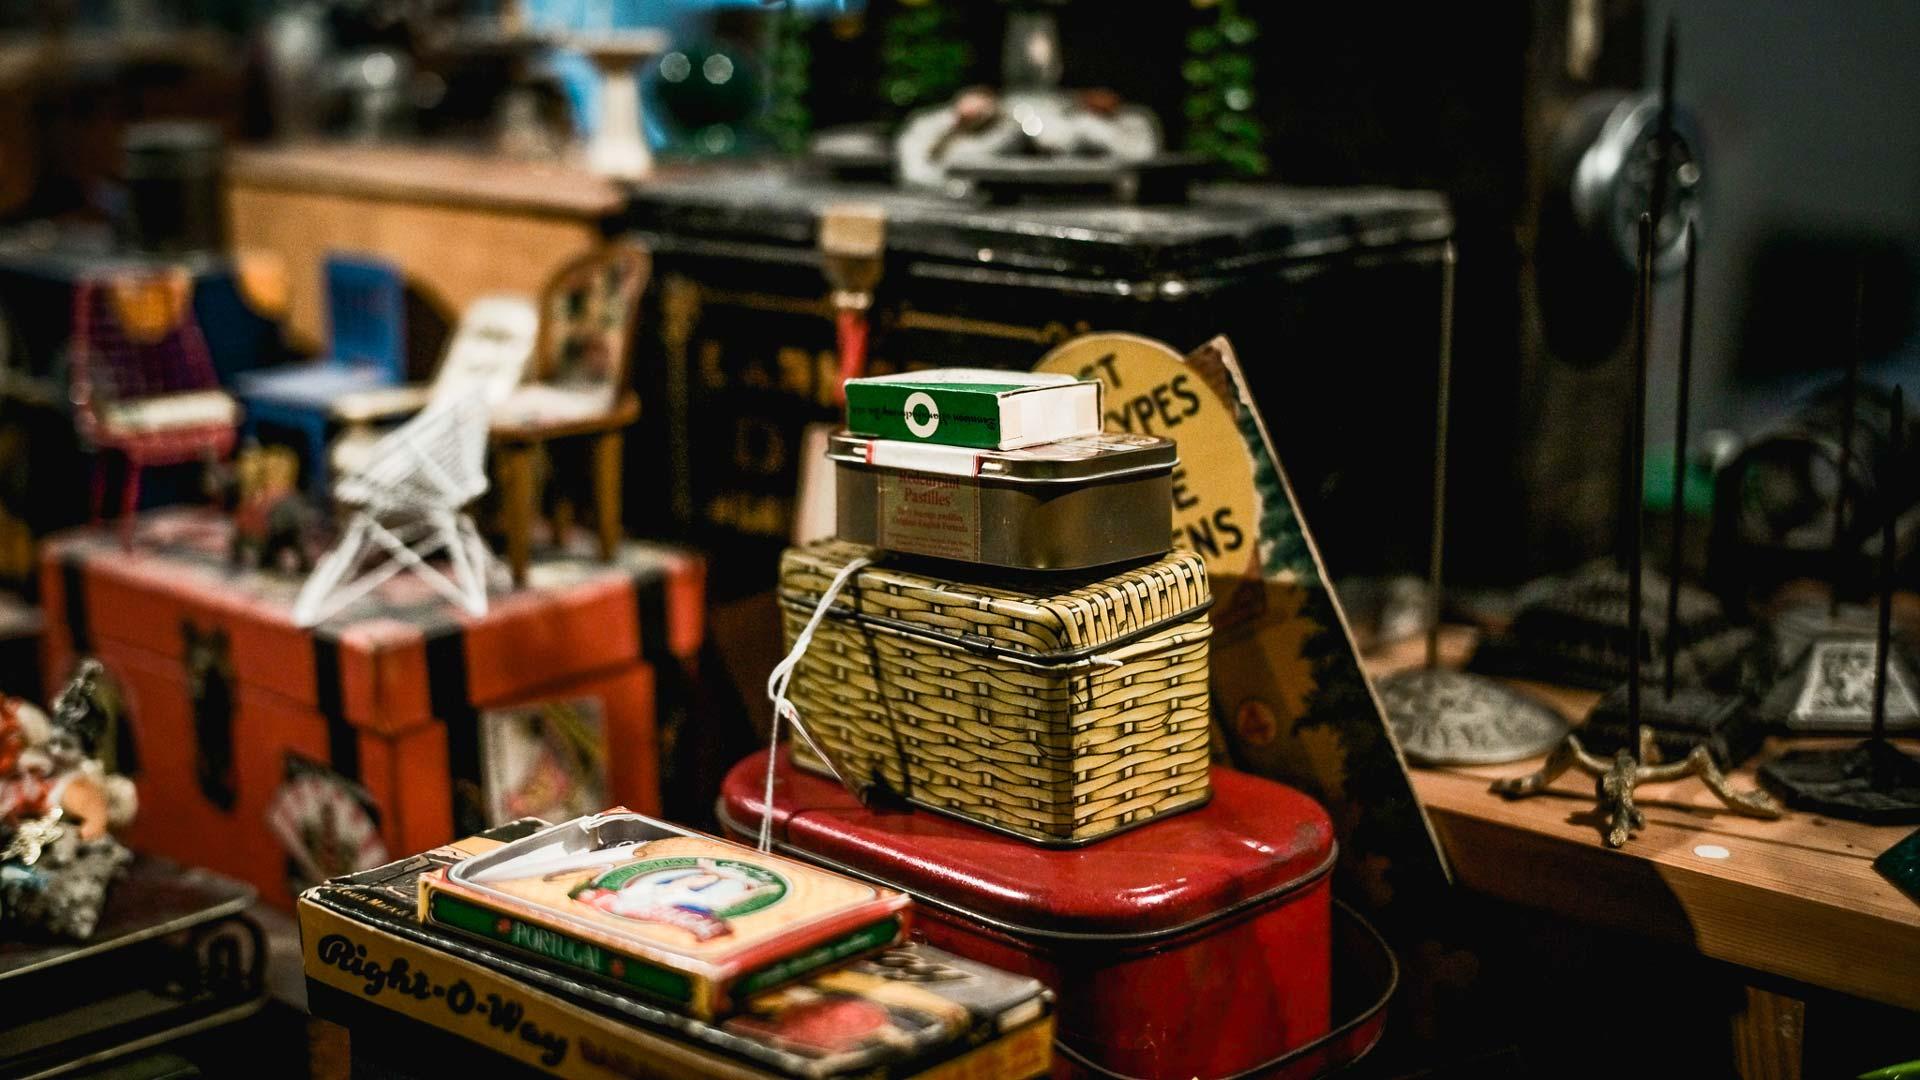 dorothy globus studio miniature baskets